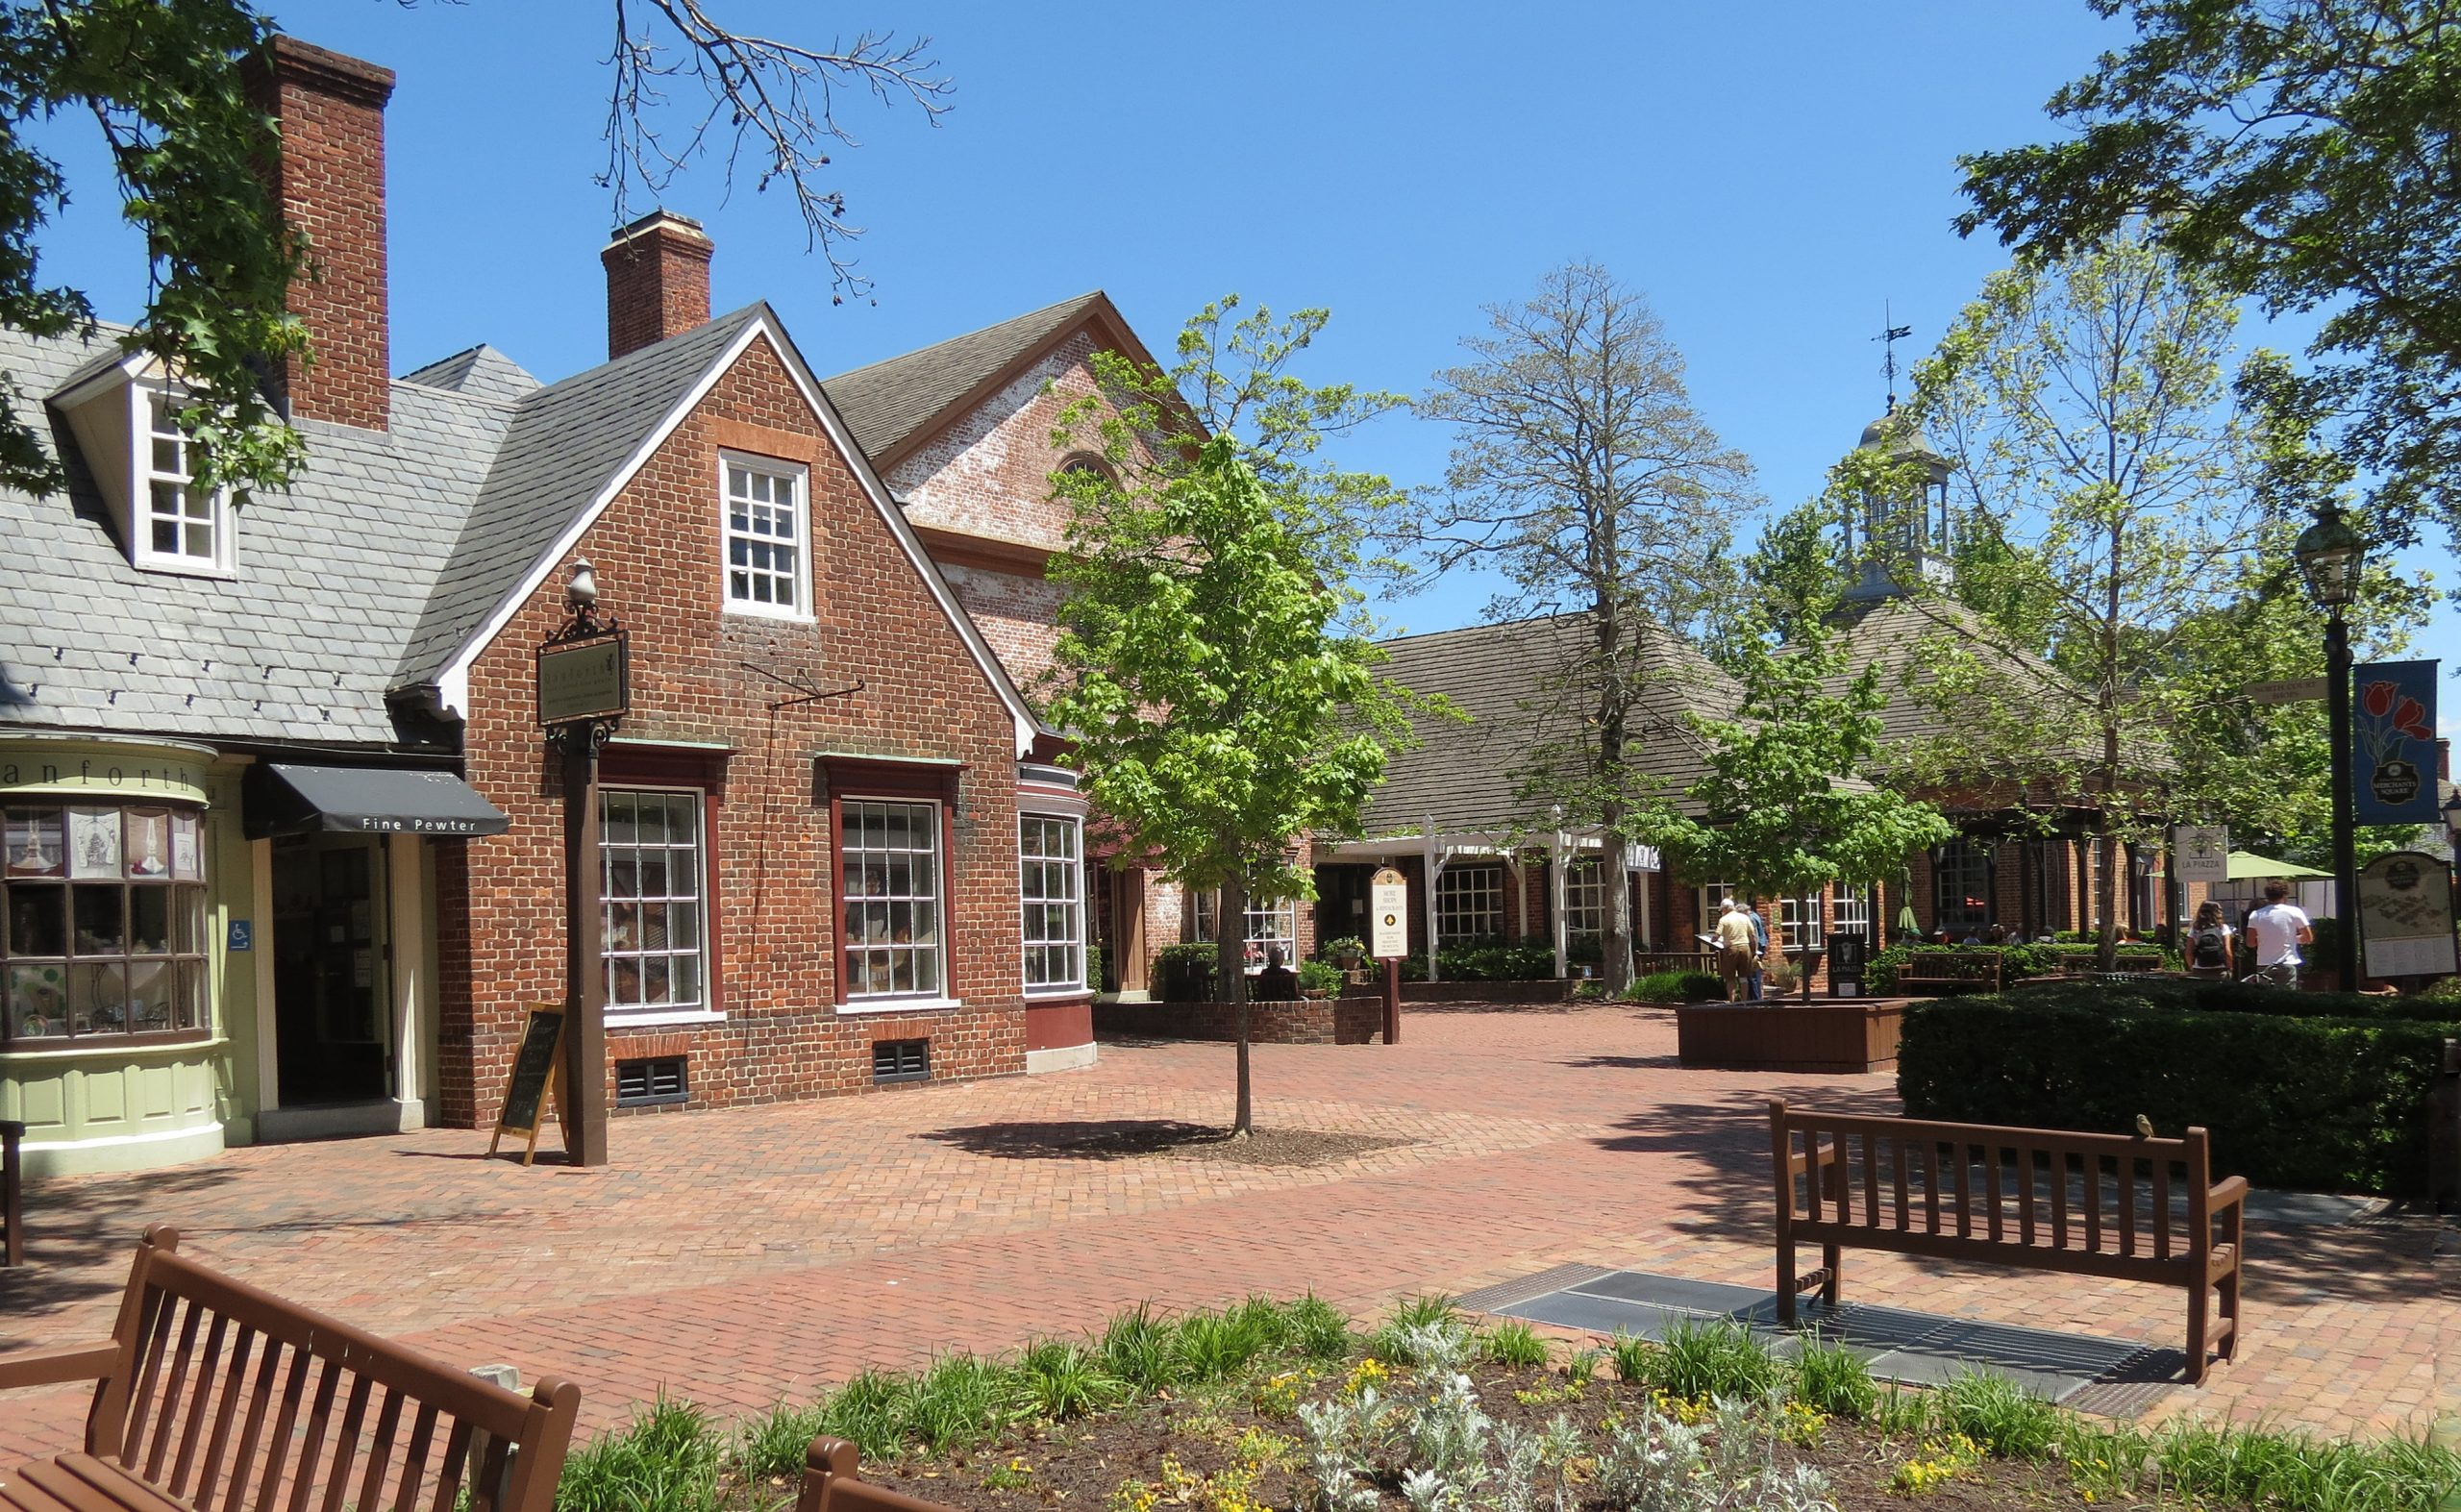 Merchants Square and Resort Historic District